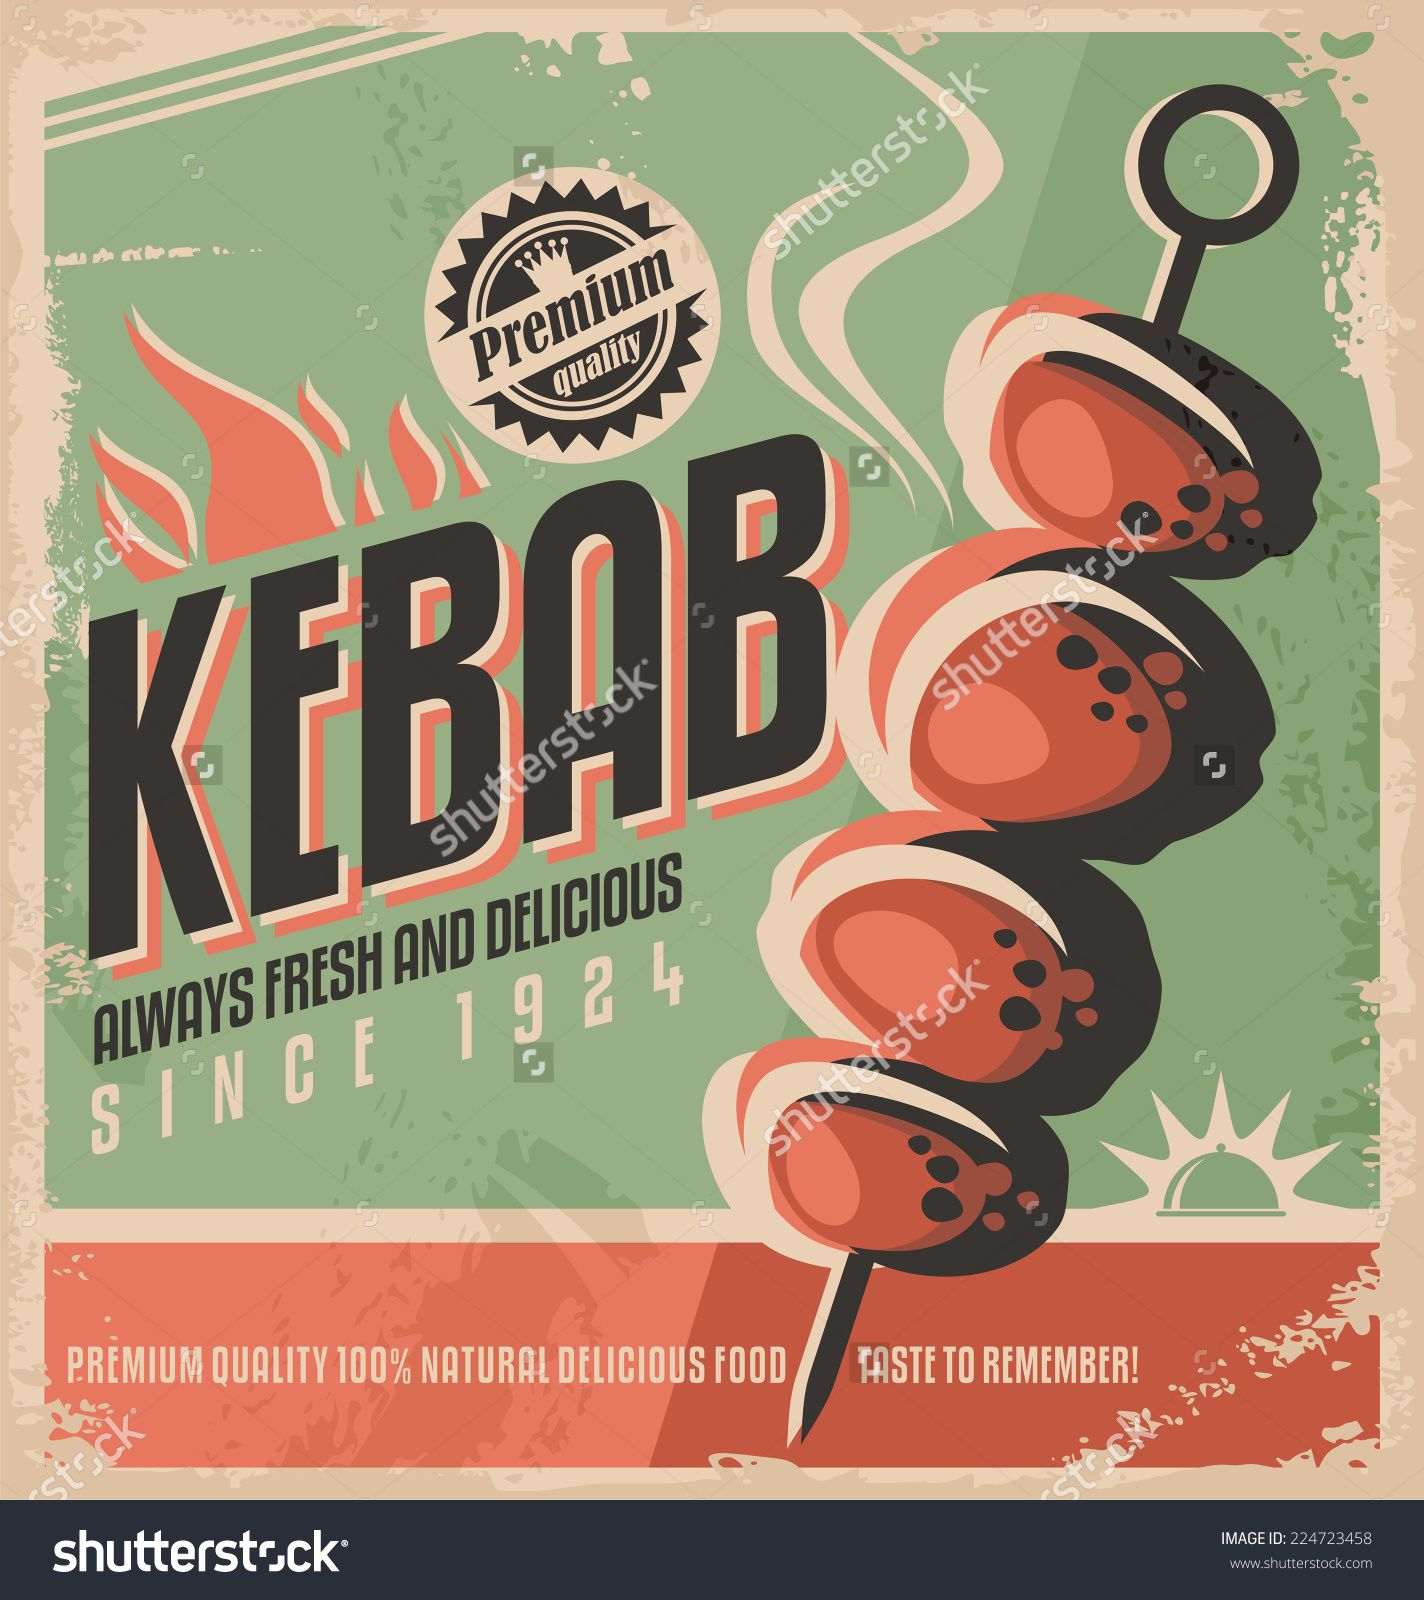 Poster design 50s - Kebab Retro Poster Design Concept Promotional Ad Design For